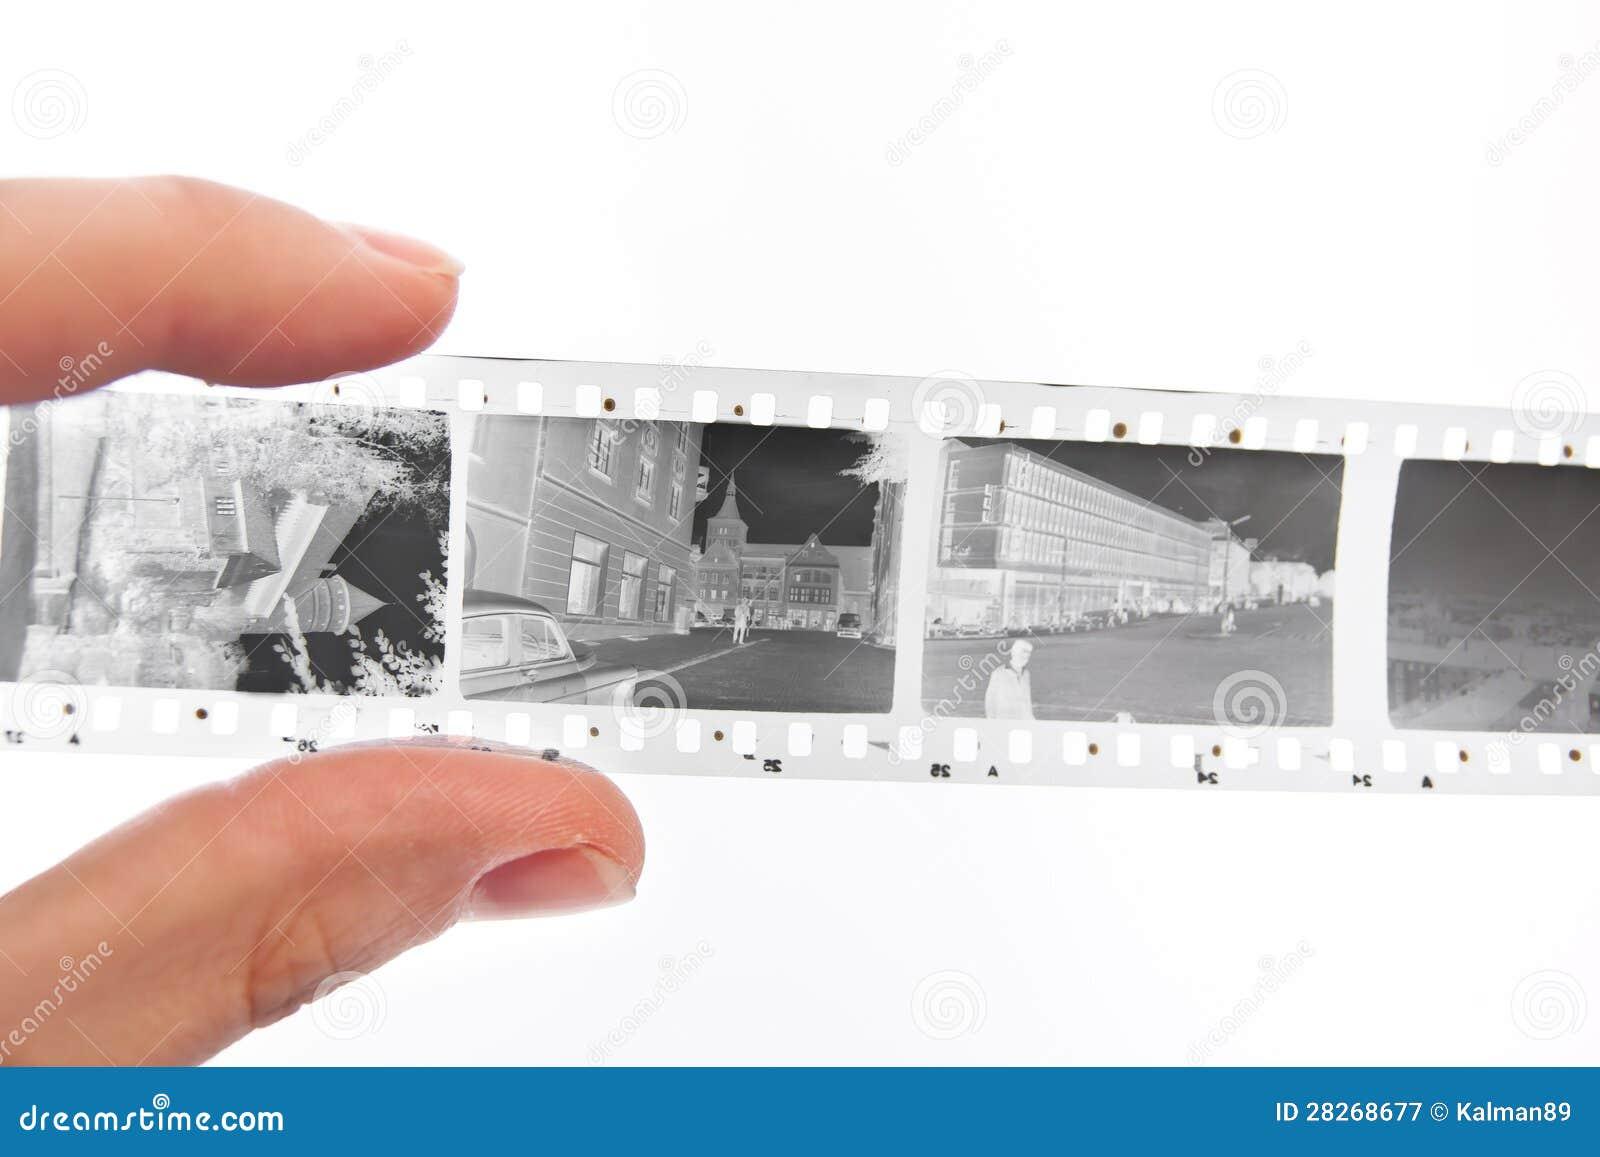 35mm filmstrip